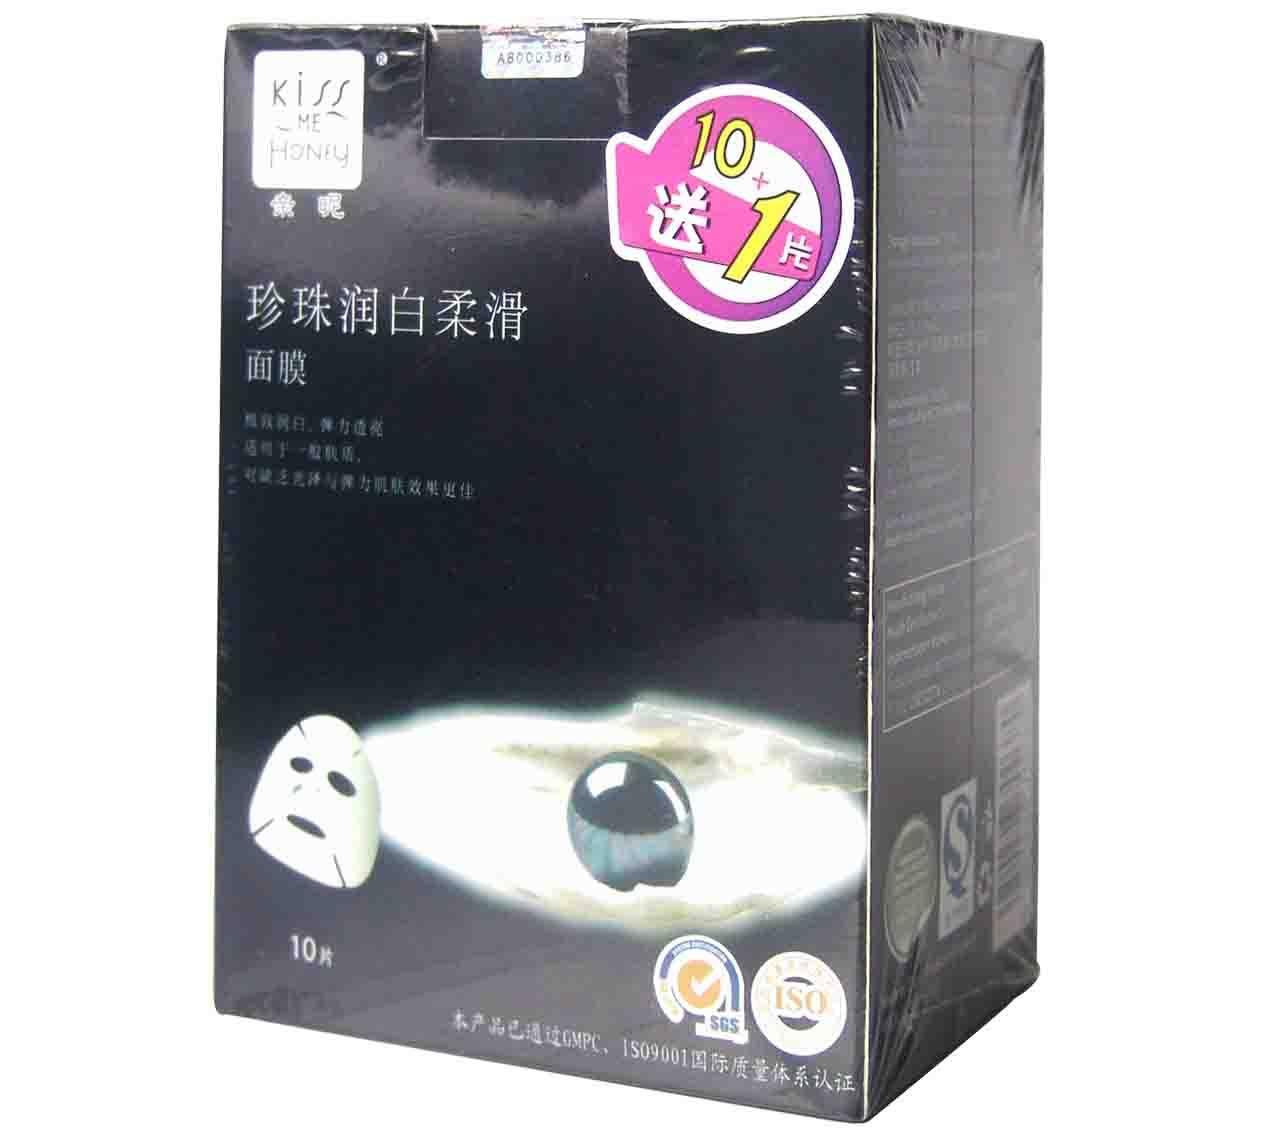 Kiss Me Honey Facial Mask-Black Pearl Powder 10PCS+1PC